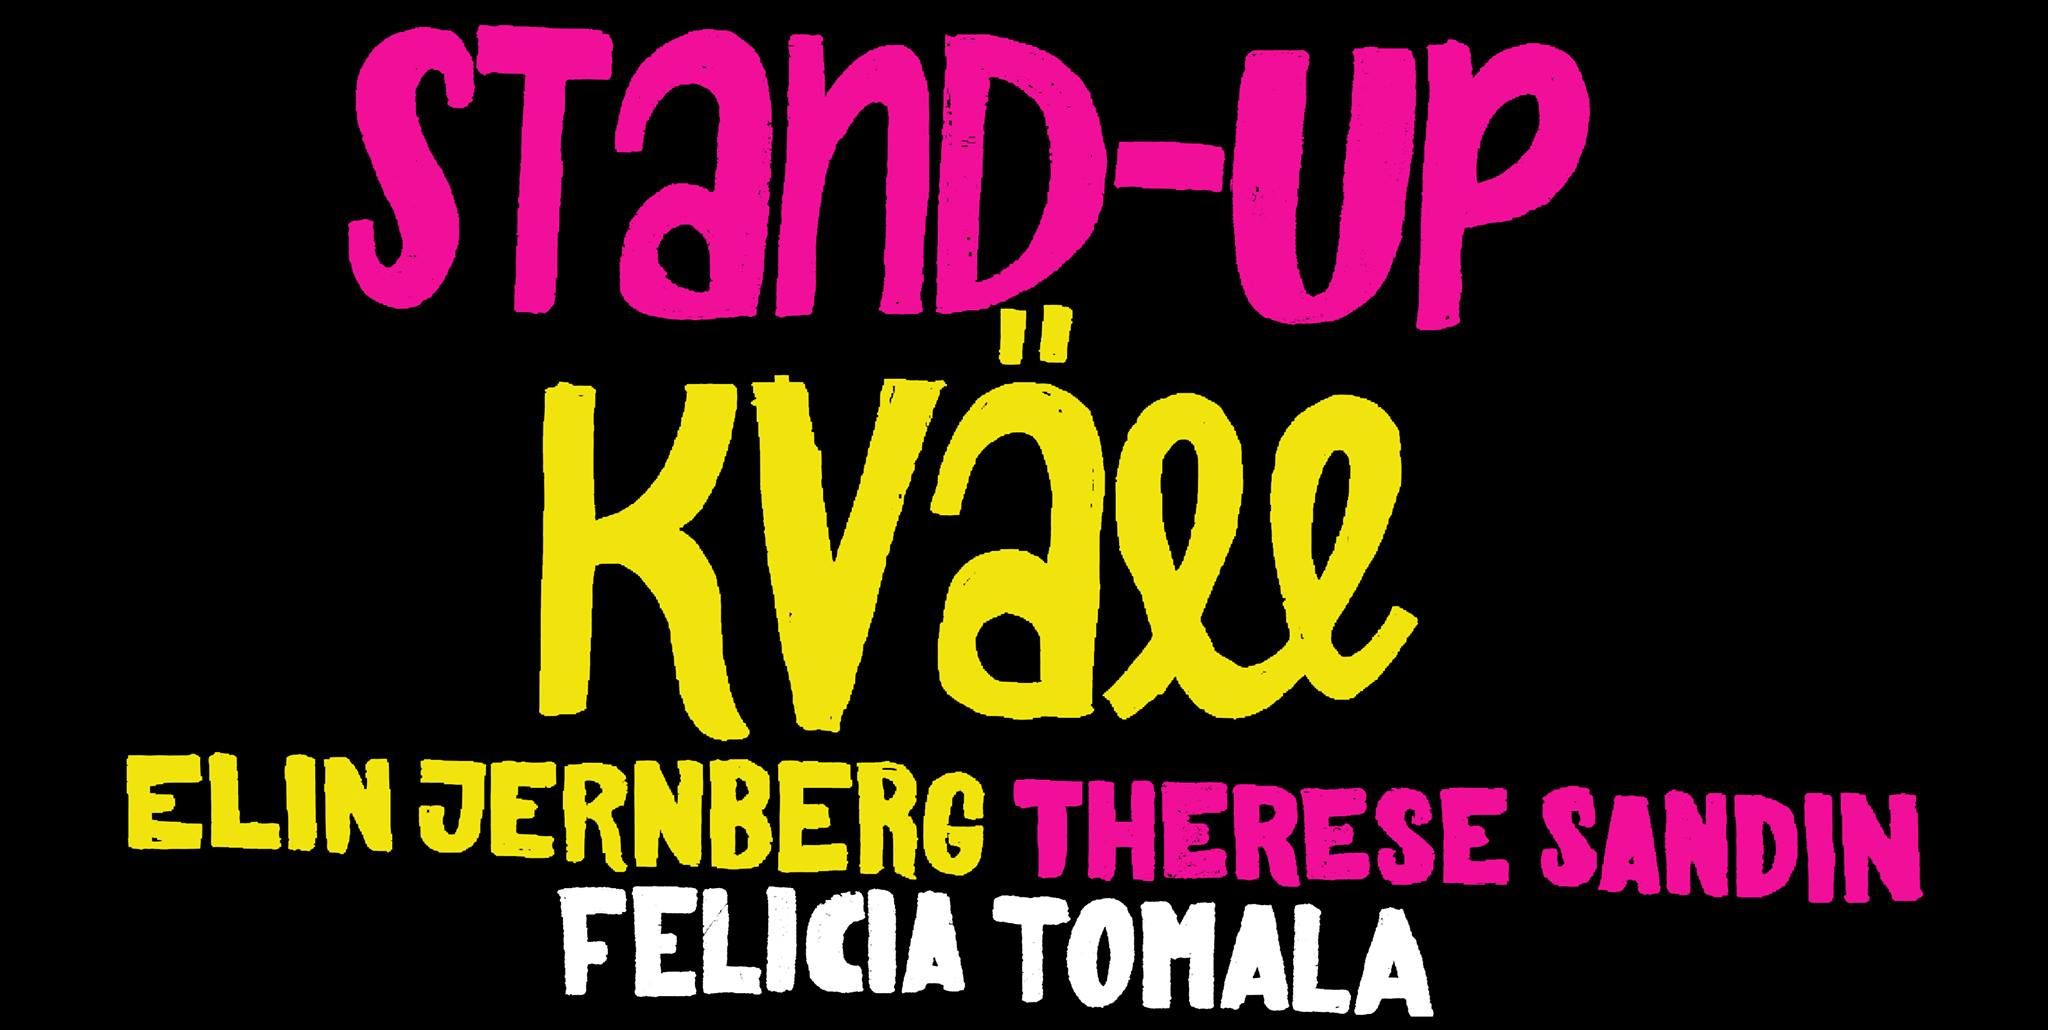 Stand-up kväll